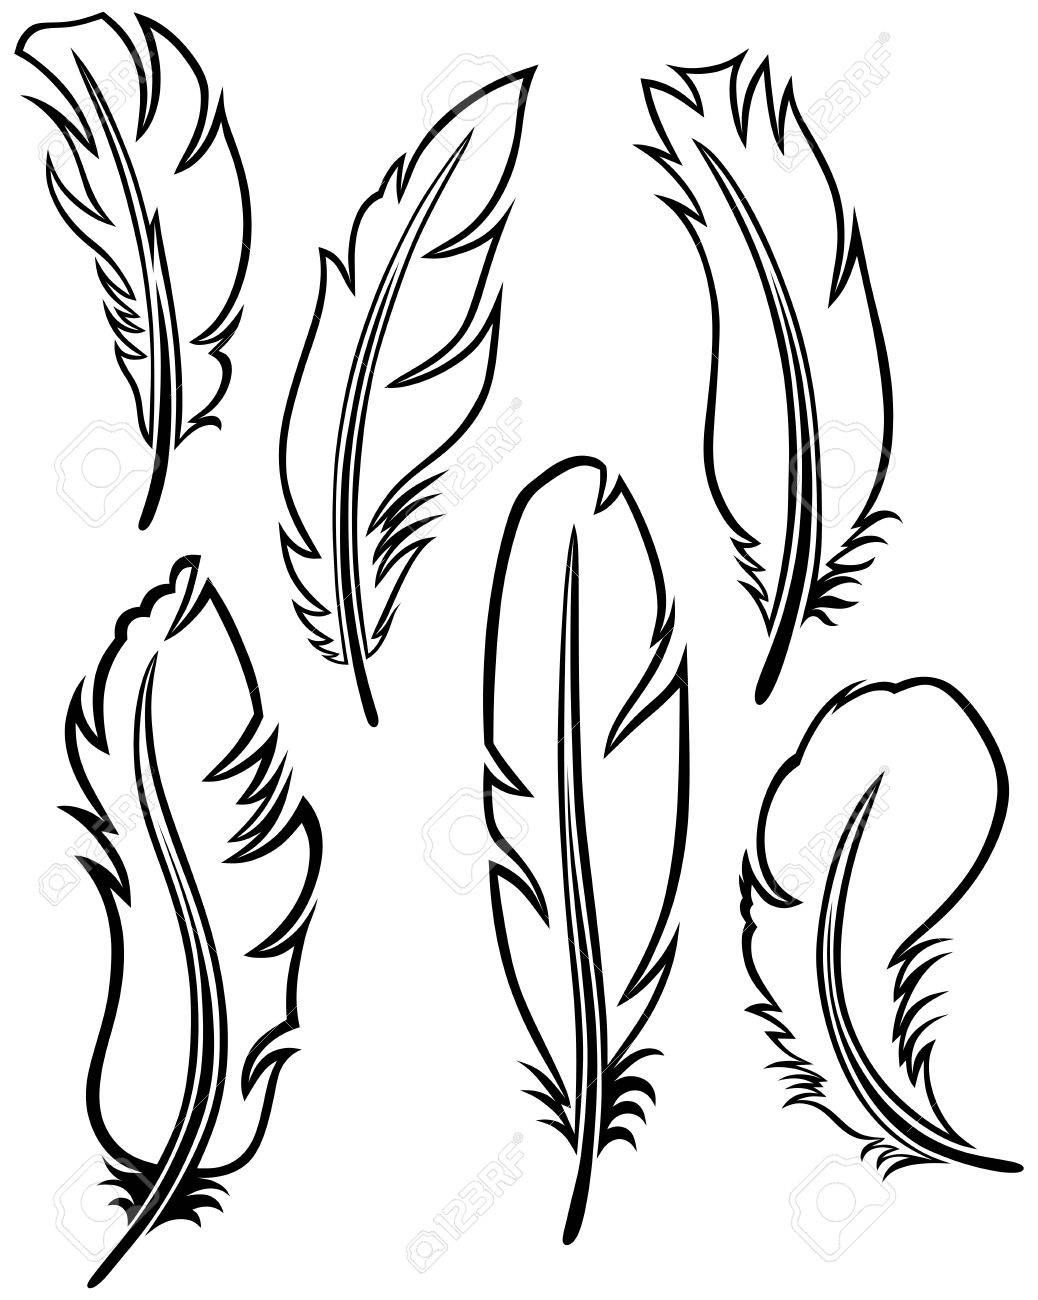 Feather Set Lizenzfrei Nutzbare Vektorgrafiken, Clip Arts, Illustrationen. Image 15785578.